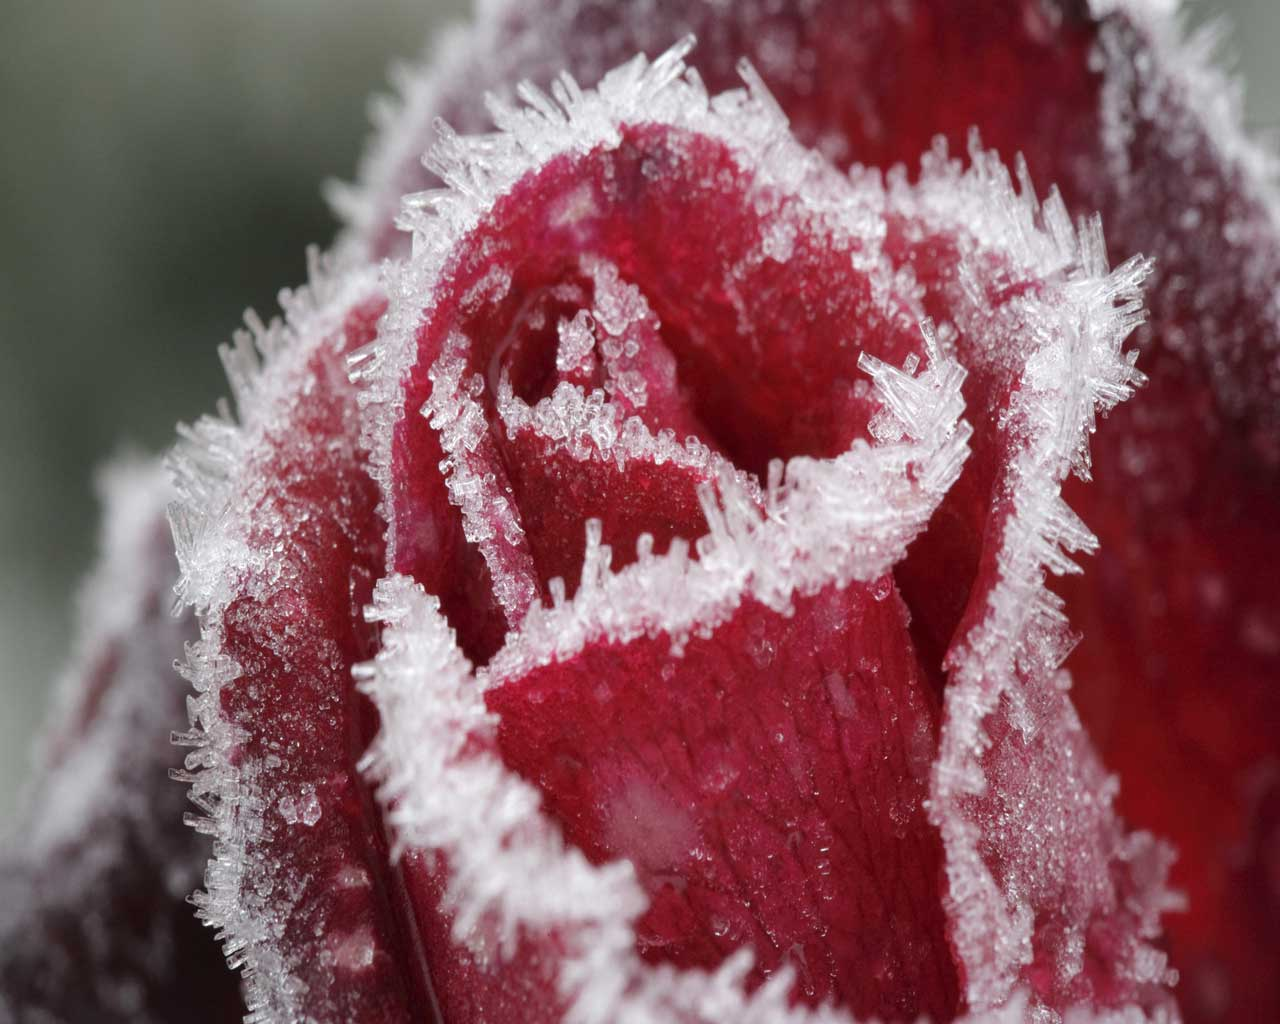 Картинка роза в снегу на компьютер, новые обои.: http://famajor.ru/kartinka_roza_v_snegu_kompjuter-5970.php